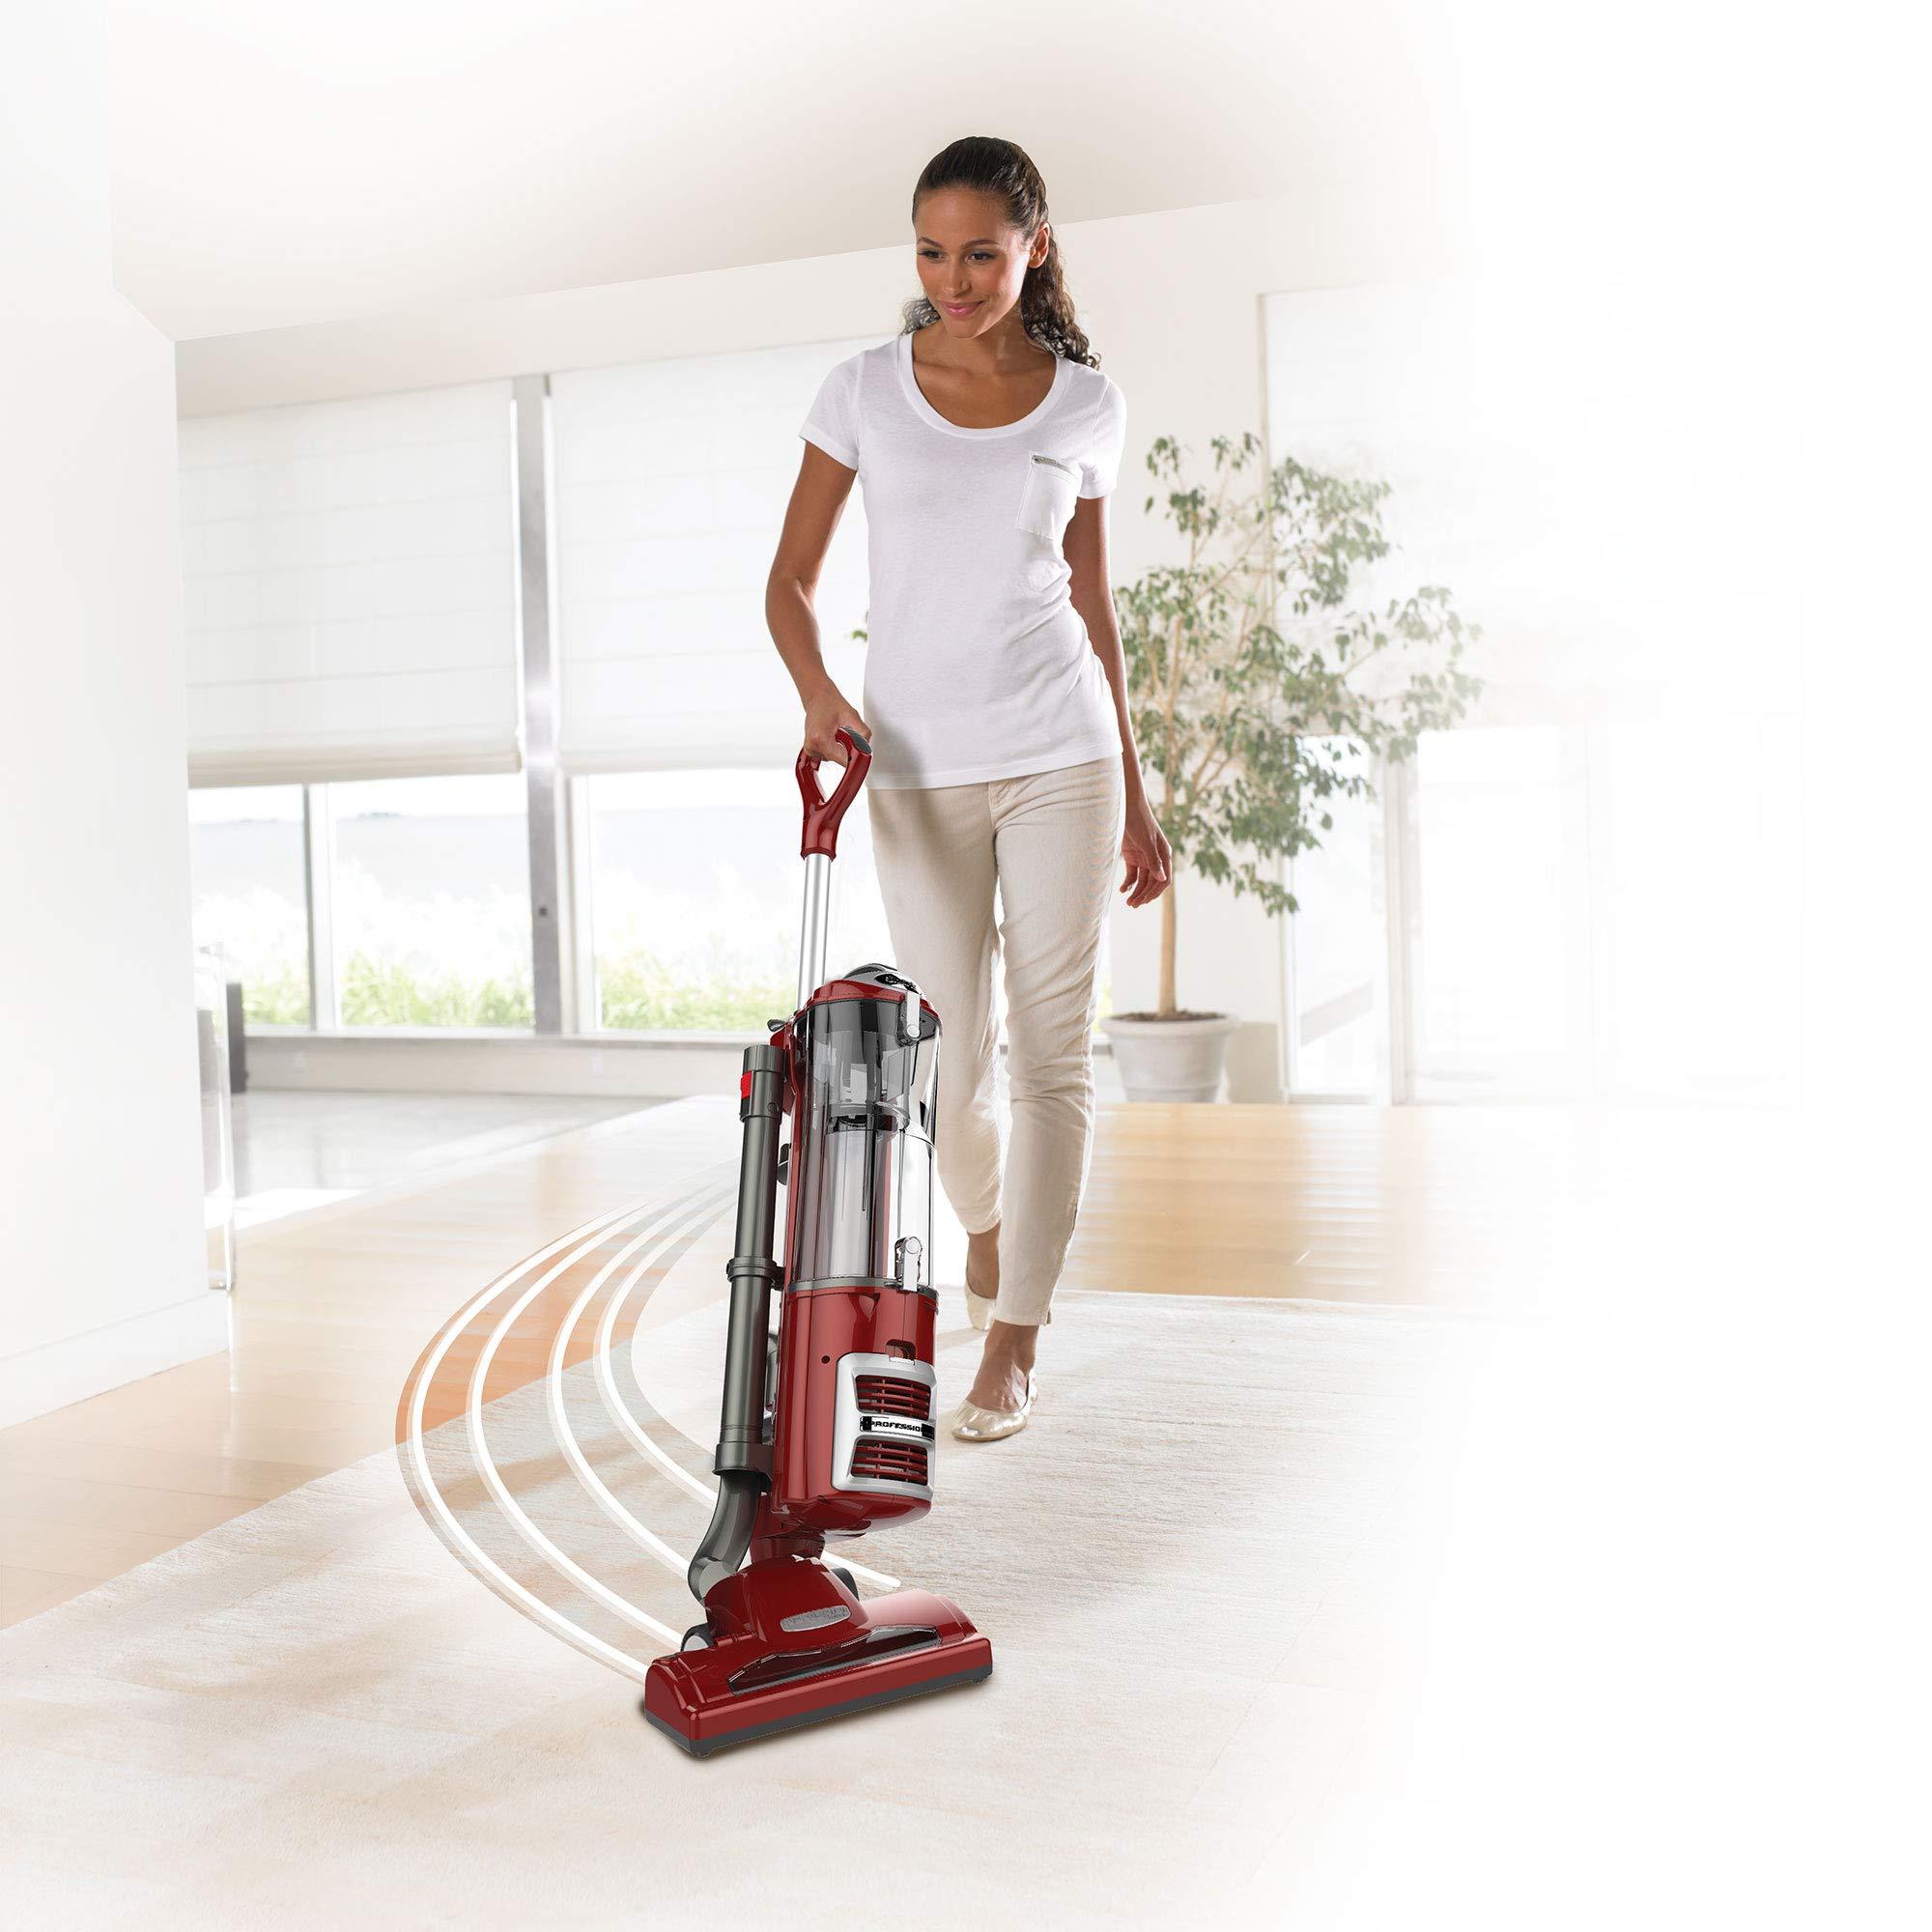 Shark NV60 Navigator Professional Upright Vacuum, Red by Shark (Image #2)